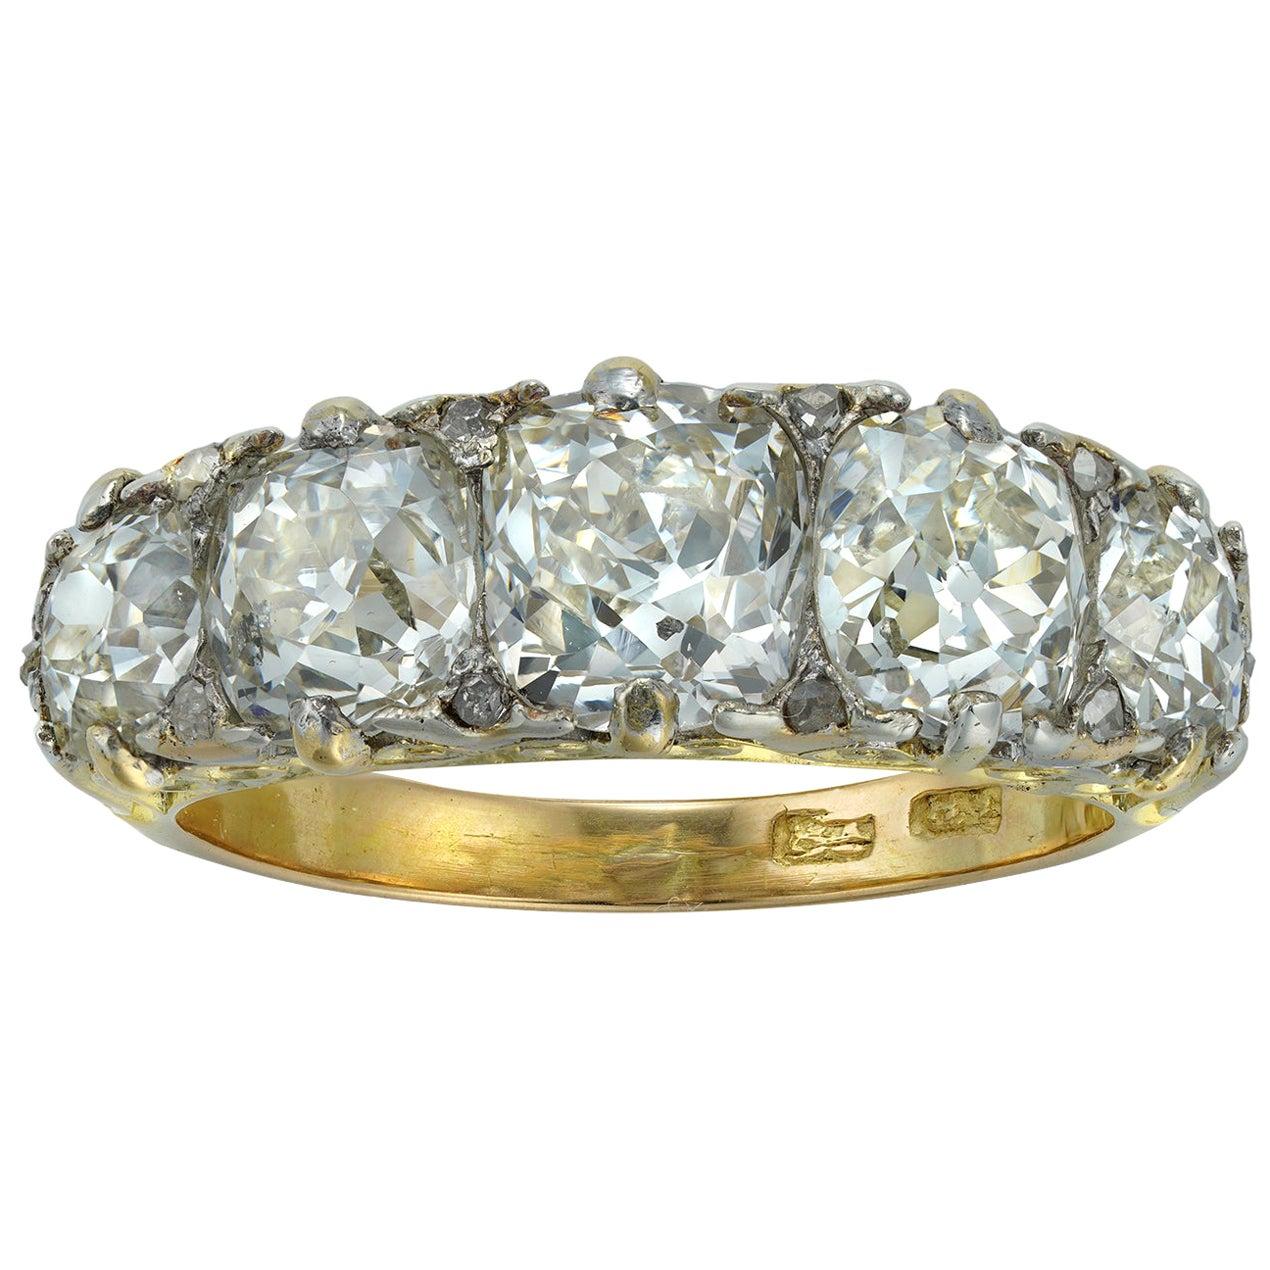 Late Victorian Five-Stone Diamond Ring